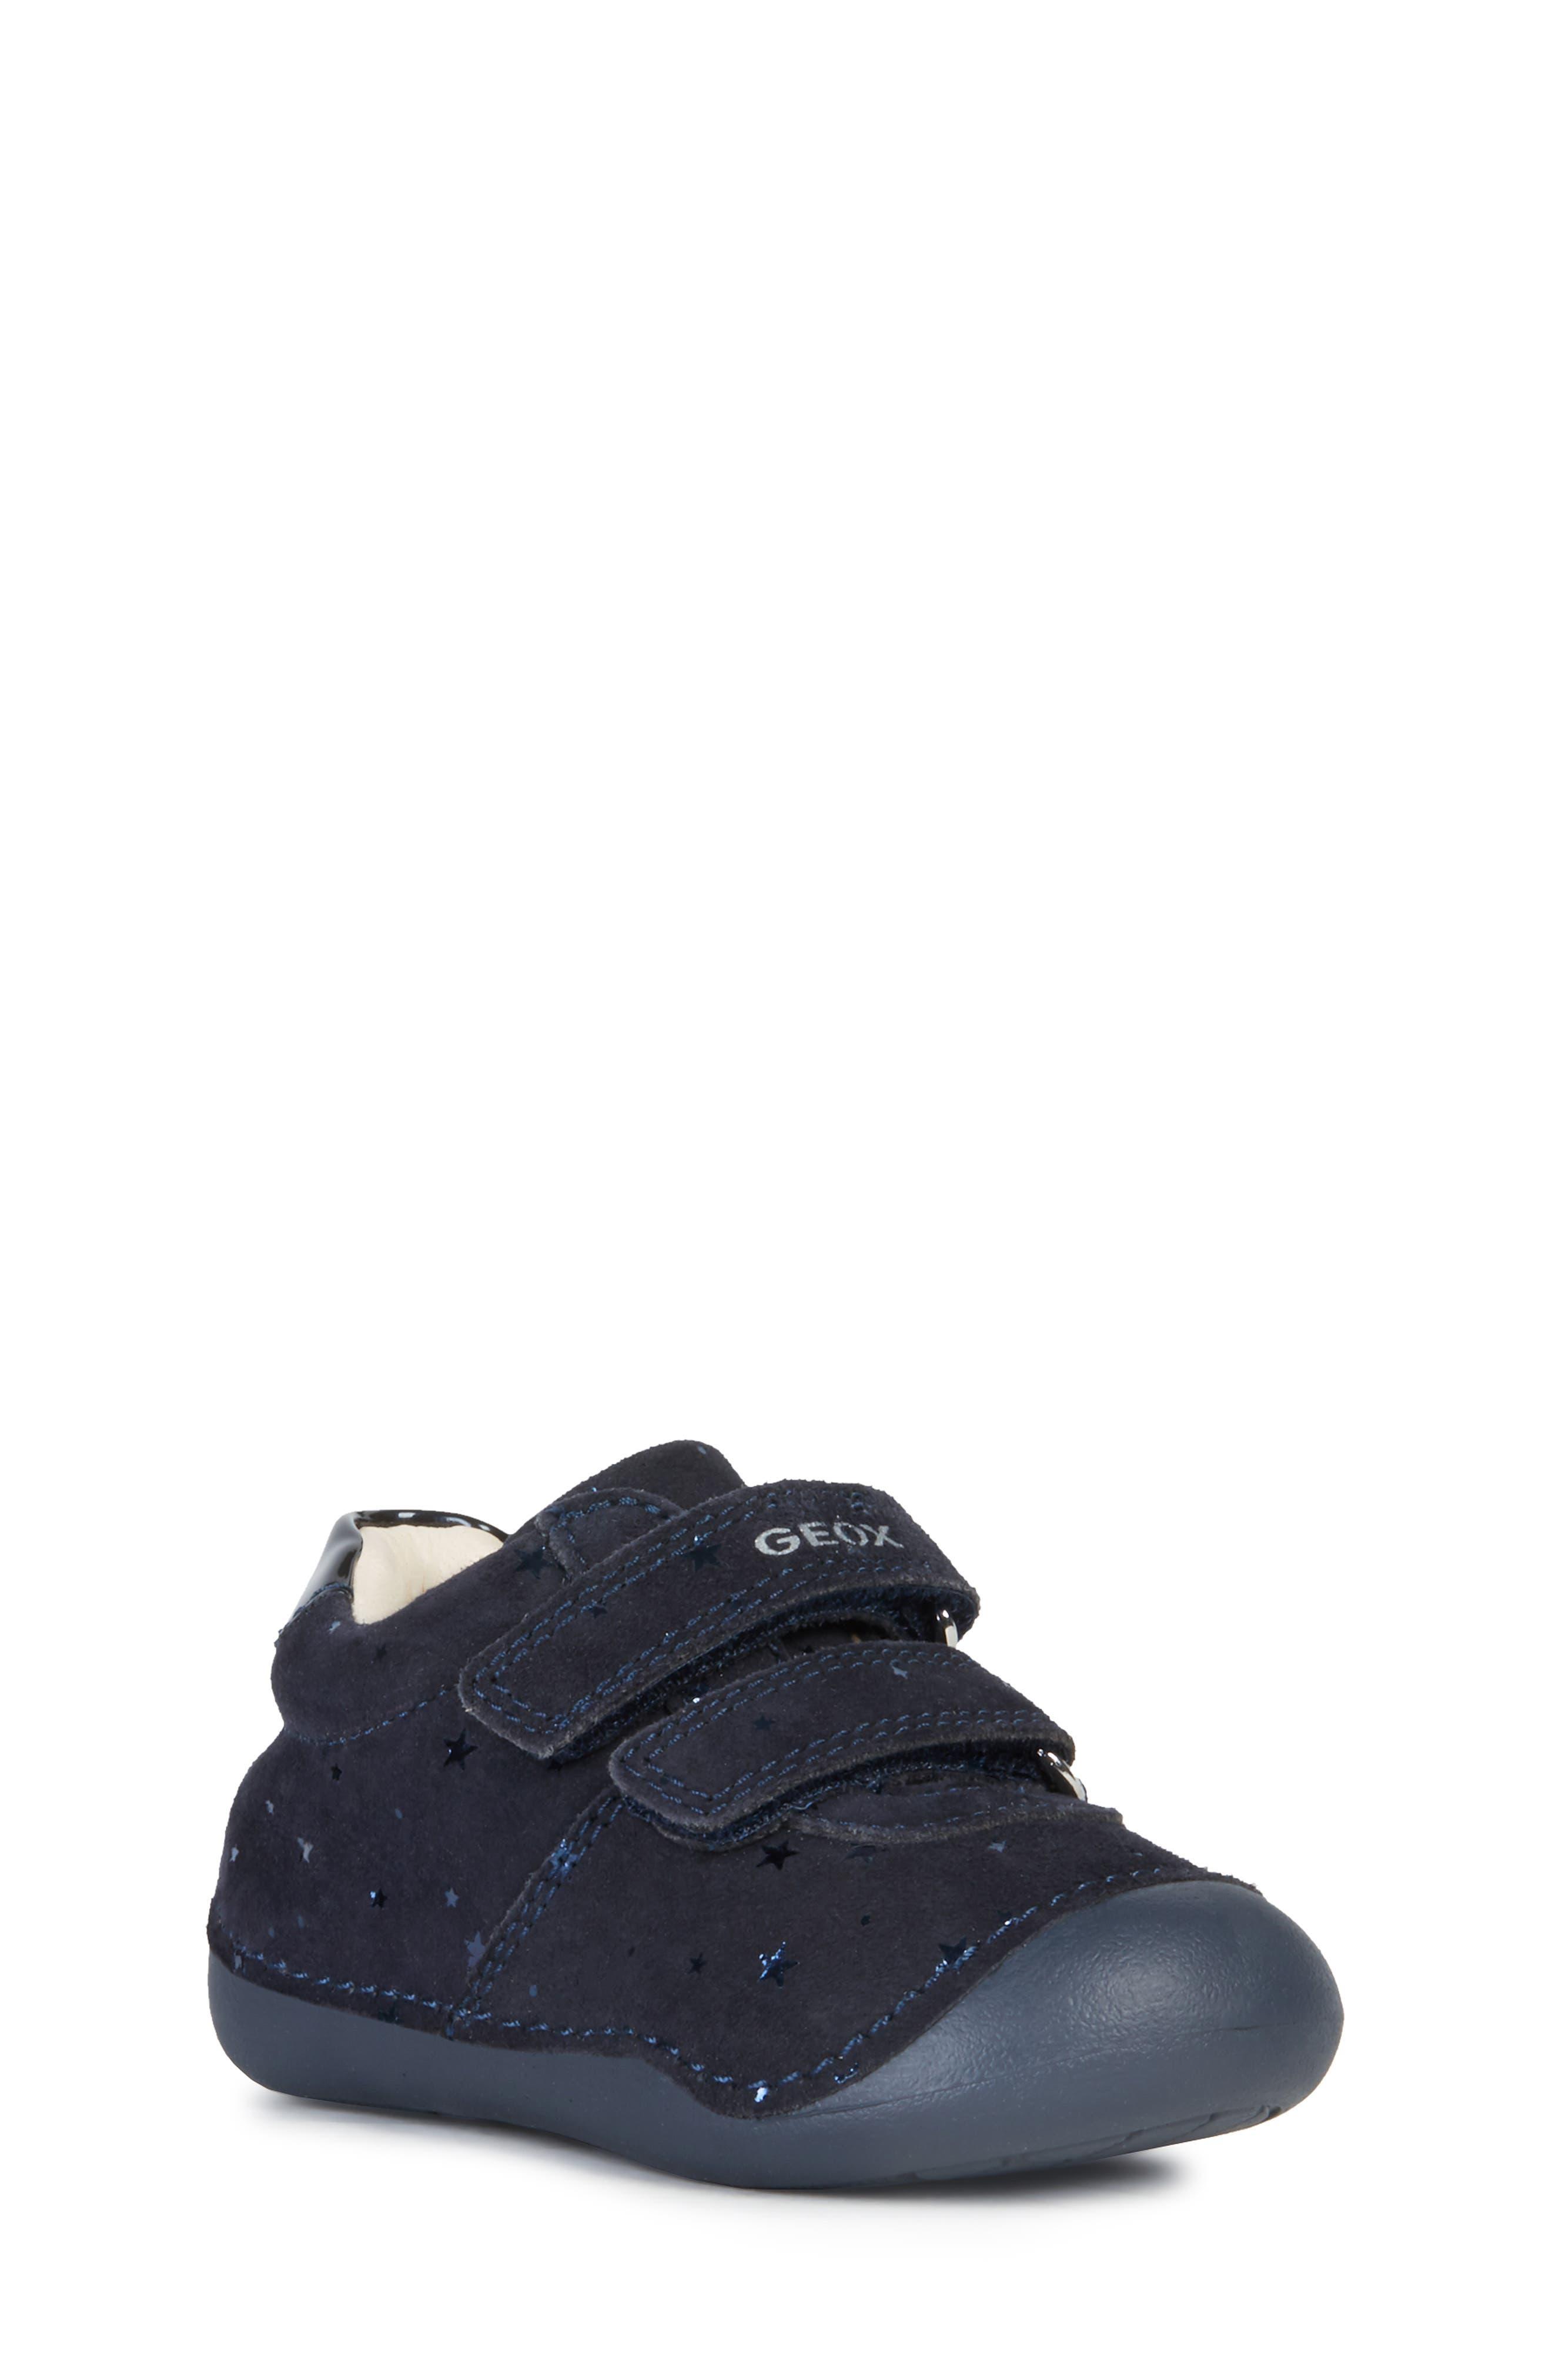 Geox B TUTIM Blau Schuhe Sneaker Low Kind 43